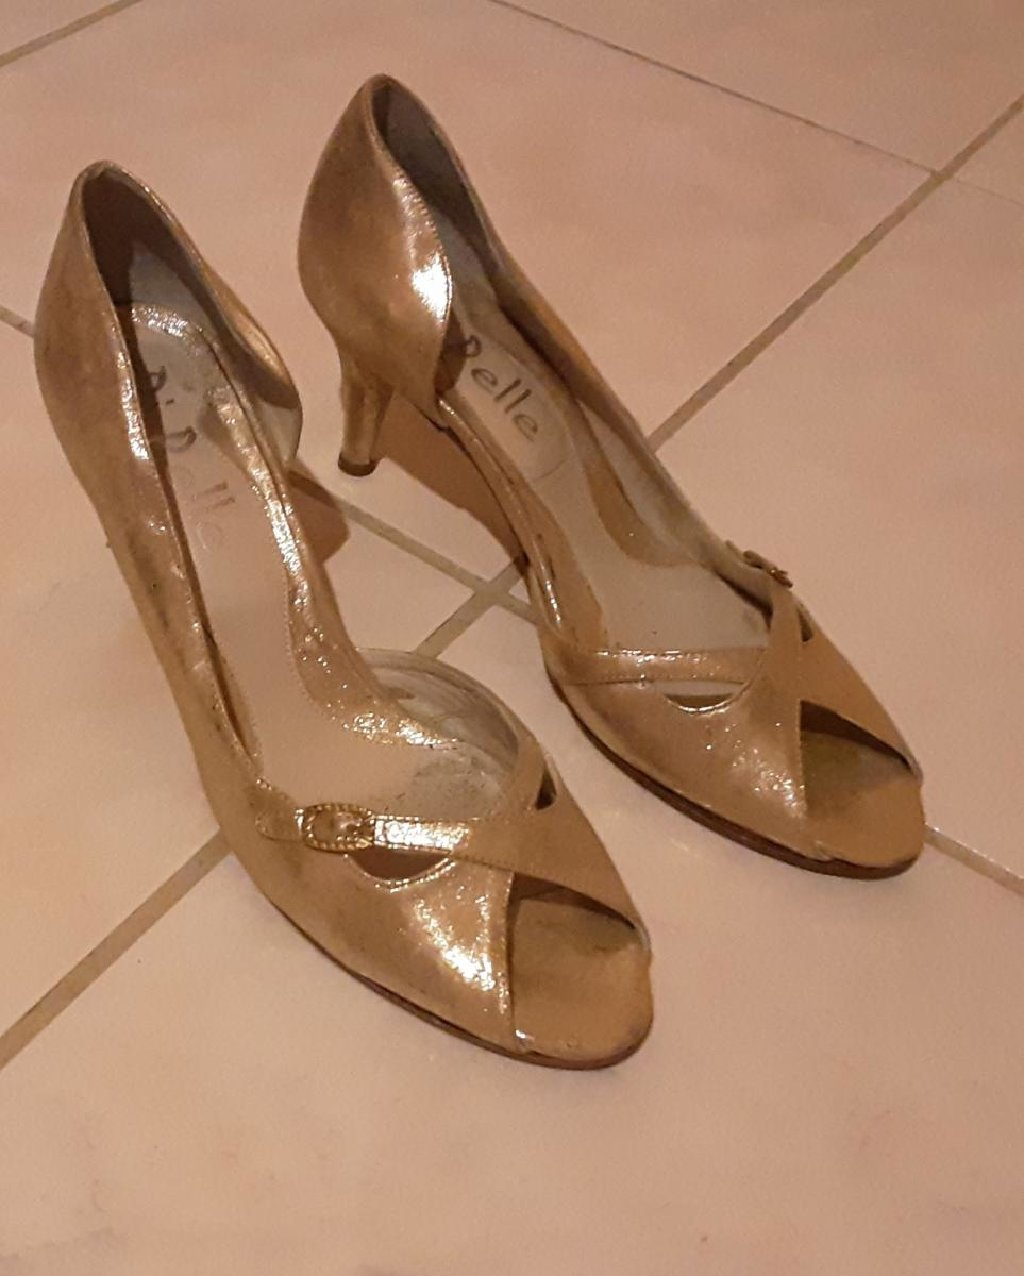 Peep Toe χρυσά, νο39, φορεμένα 1 φορά (κωδ. 102)